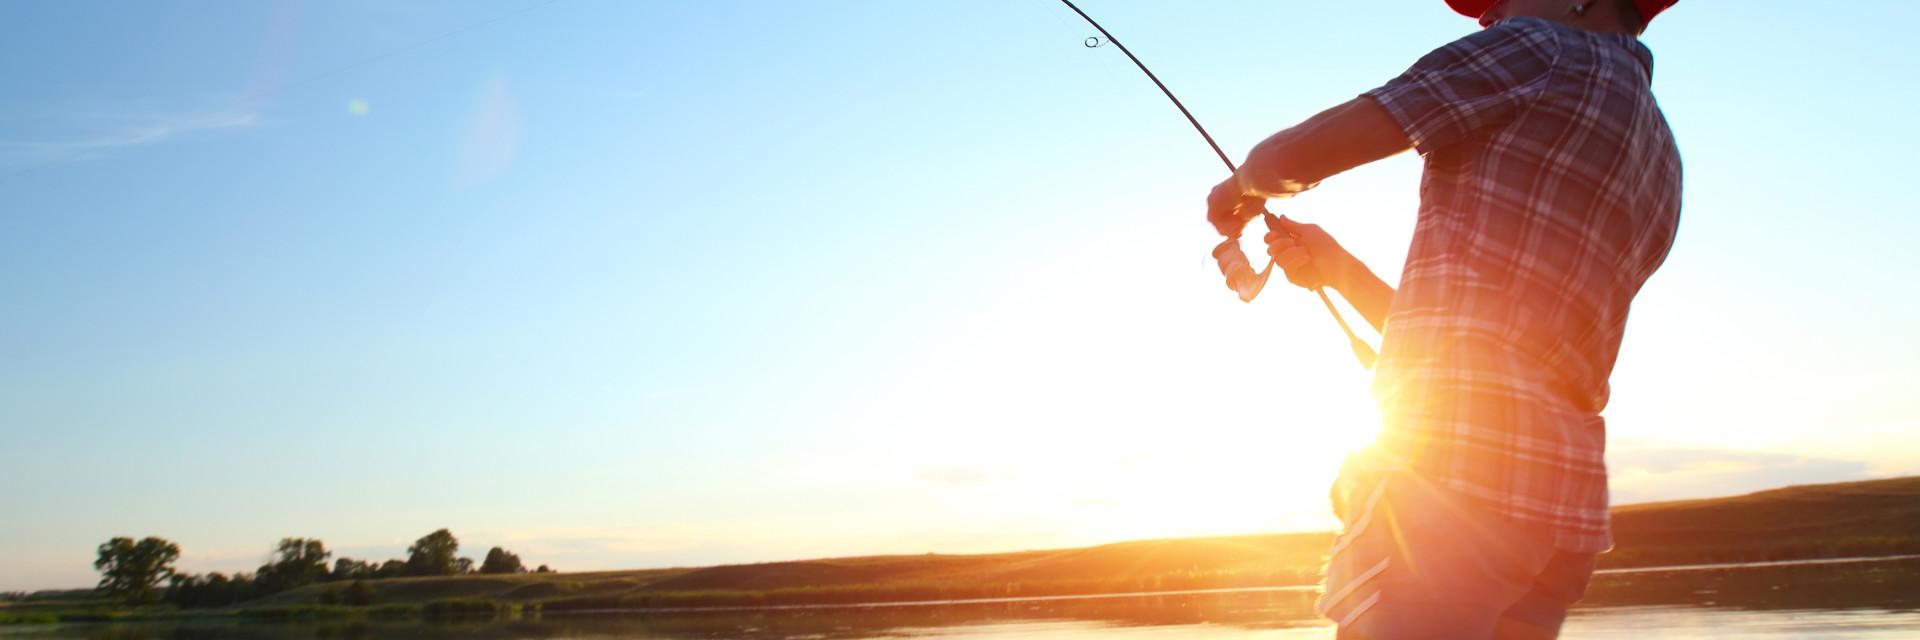 fishing, walleye, bass, perch, boating, Lake gogebic